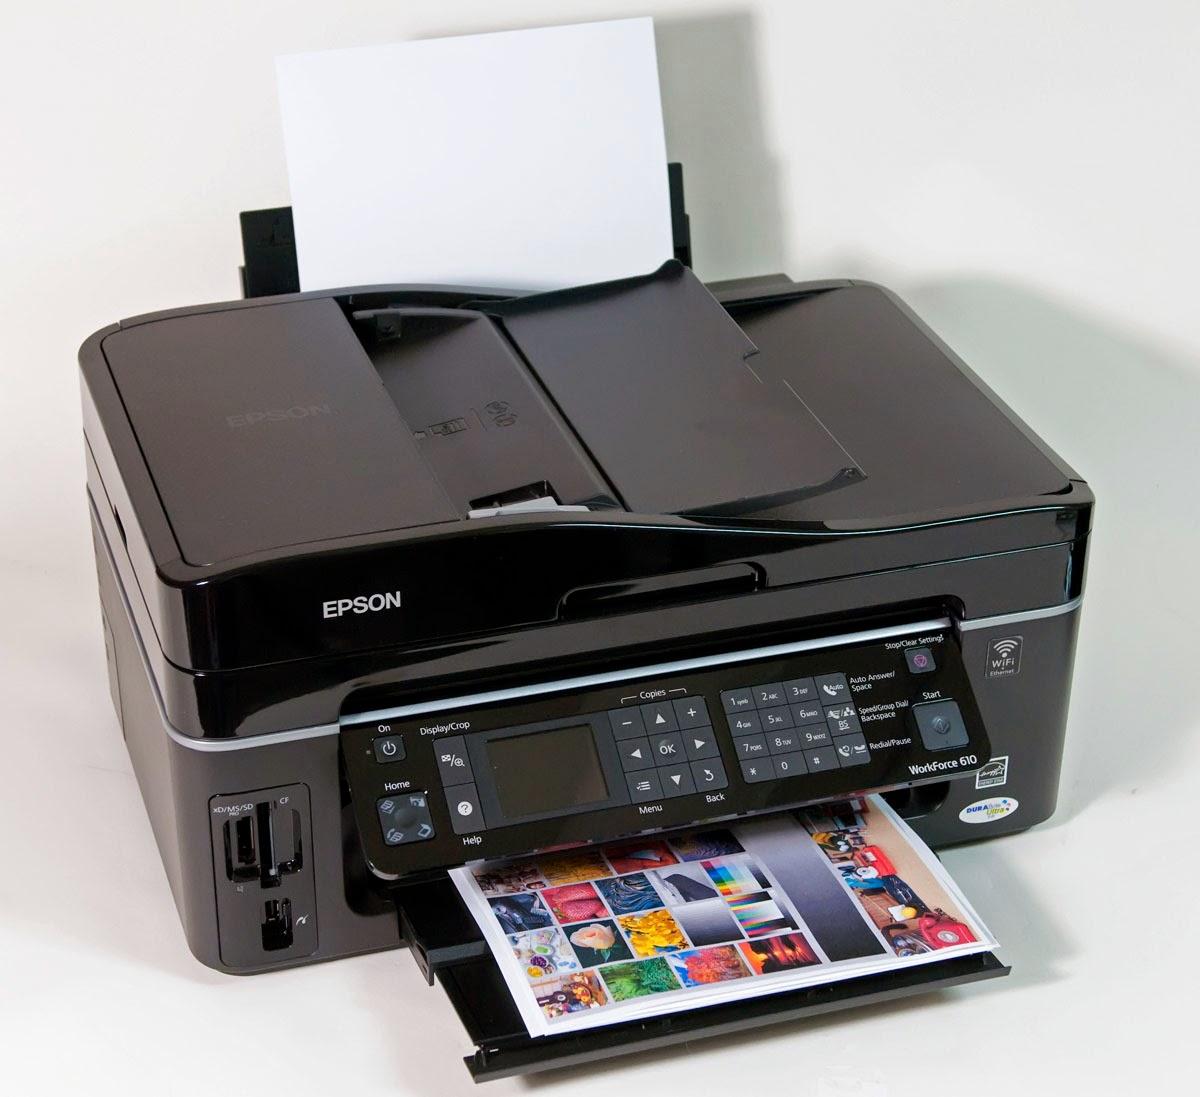 Счетчик бумаги на принтере epson